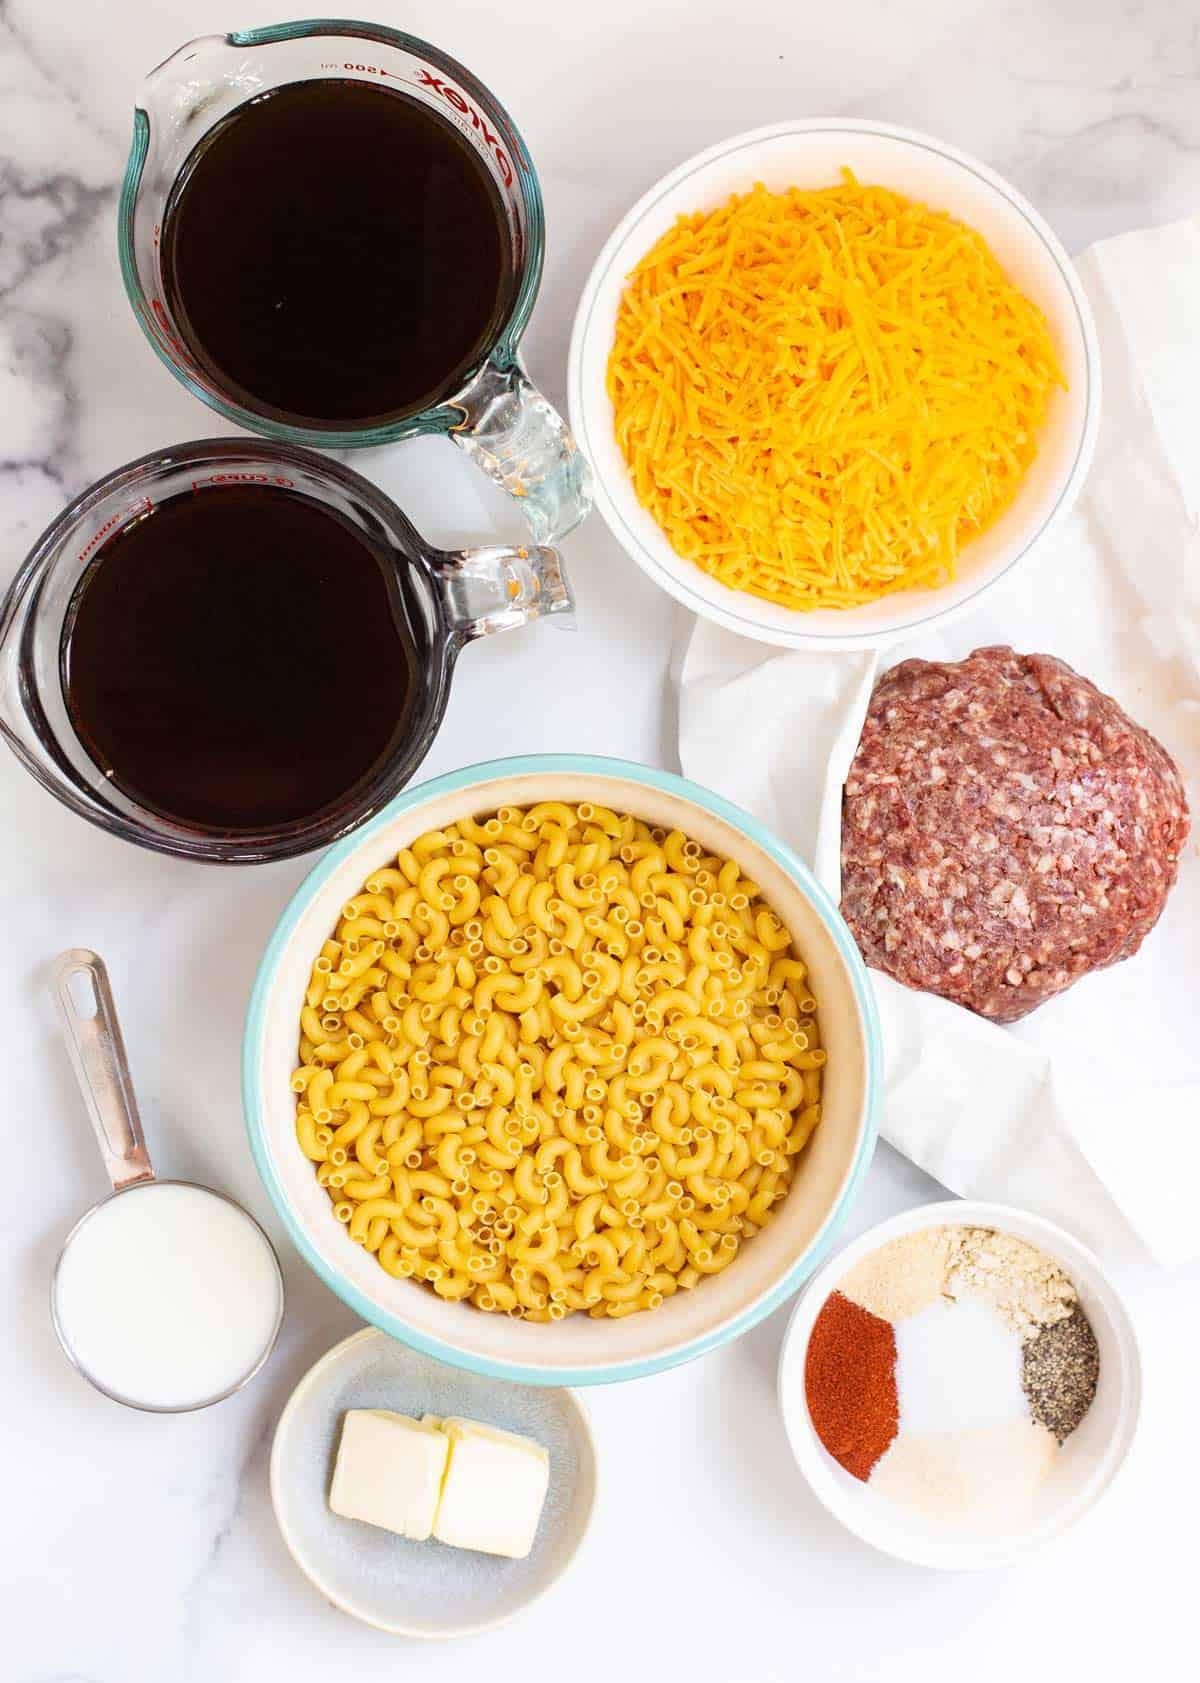 Instant Pot Cheeseburger Macaroni Ingredients: ground beef, elbow macaroni, beef broth, butter, paprika, onion powder, garlic powder, mustard powder, salt, ground black pepper, shredded cheddar cheese, and heavy whipping cream.